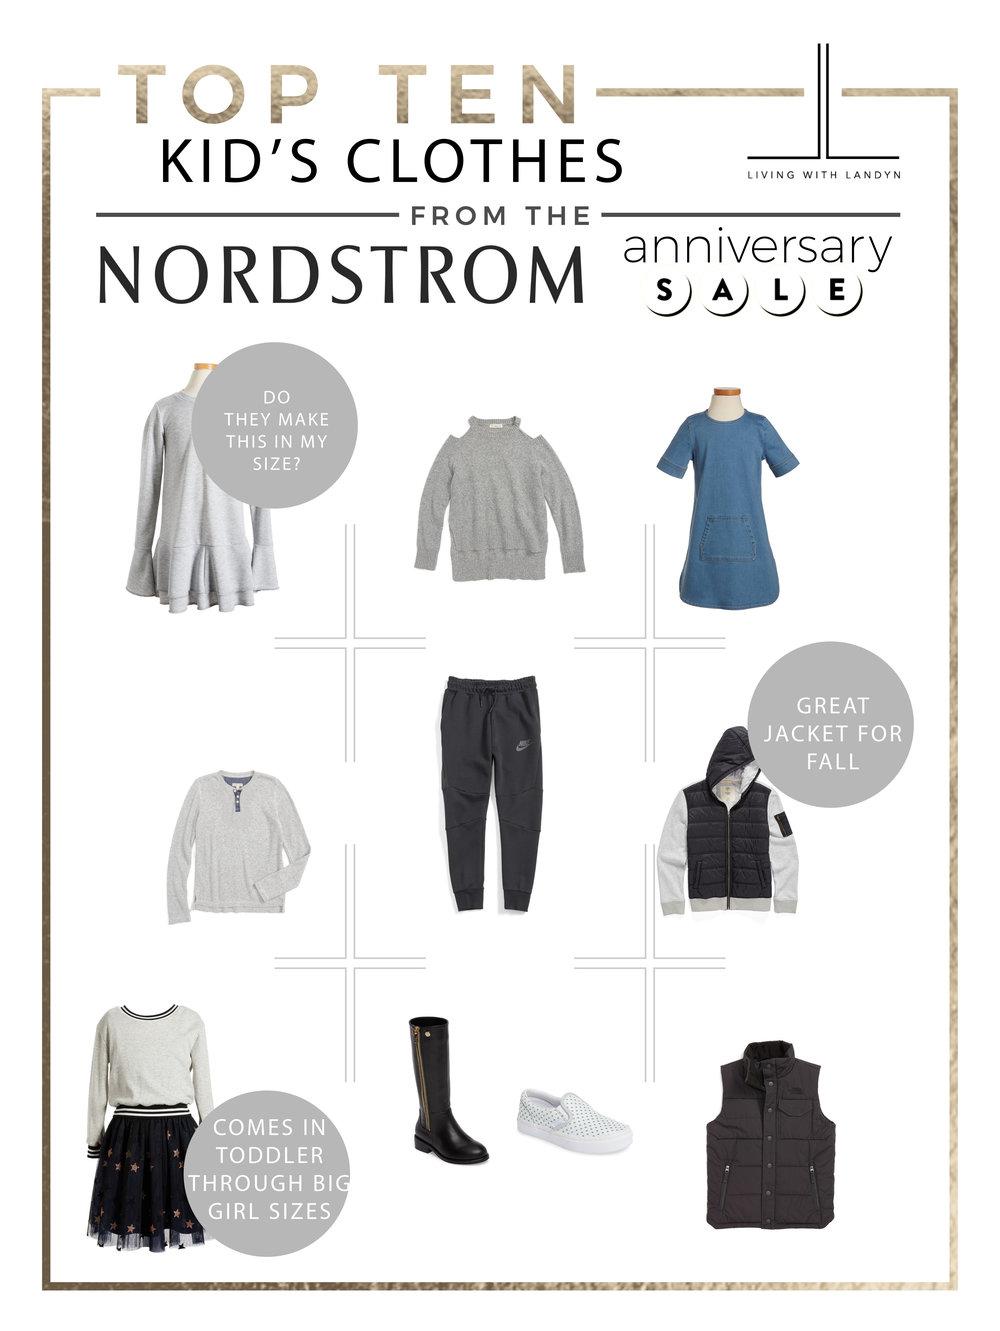 TOP 10 PICKS KIDS CLOTHES NORDSTROM ANNIVERSARY SALE